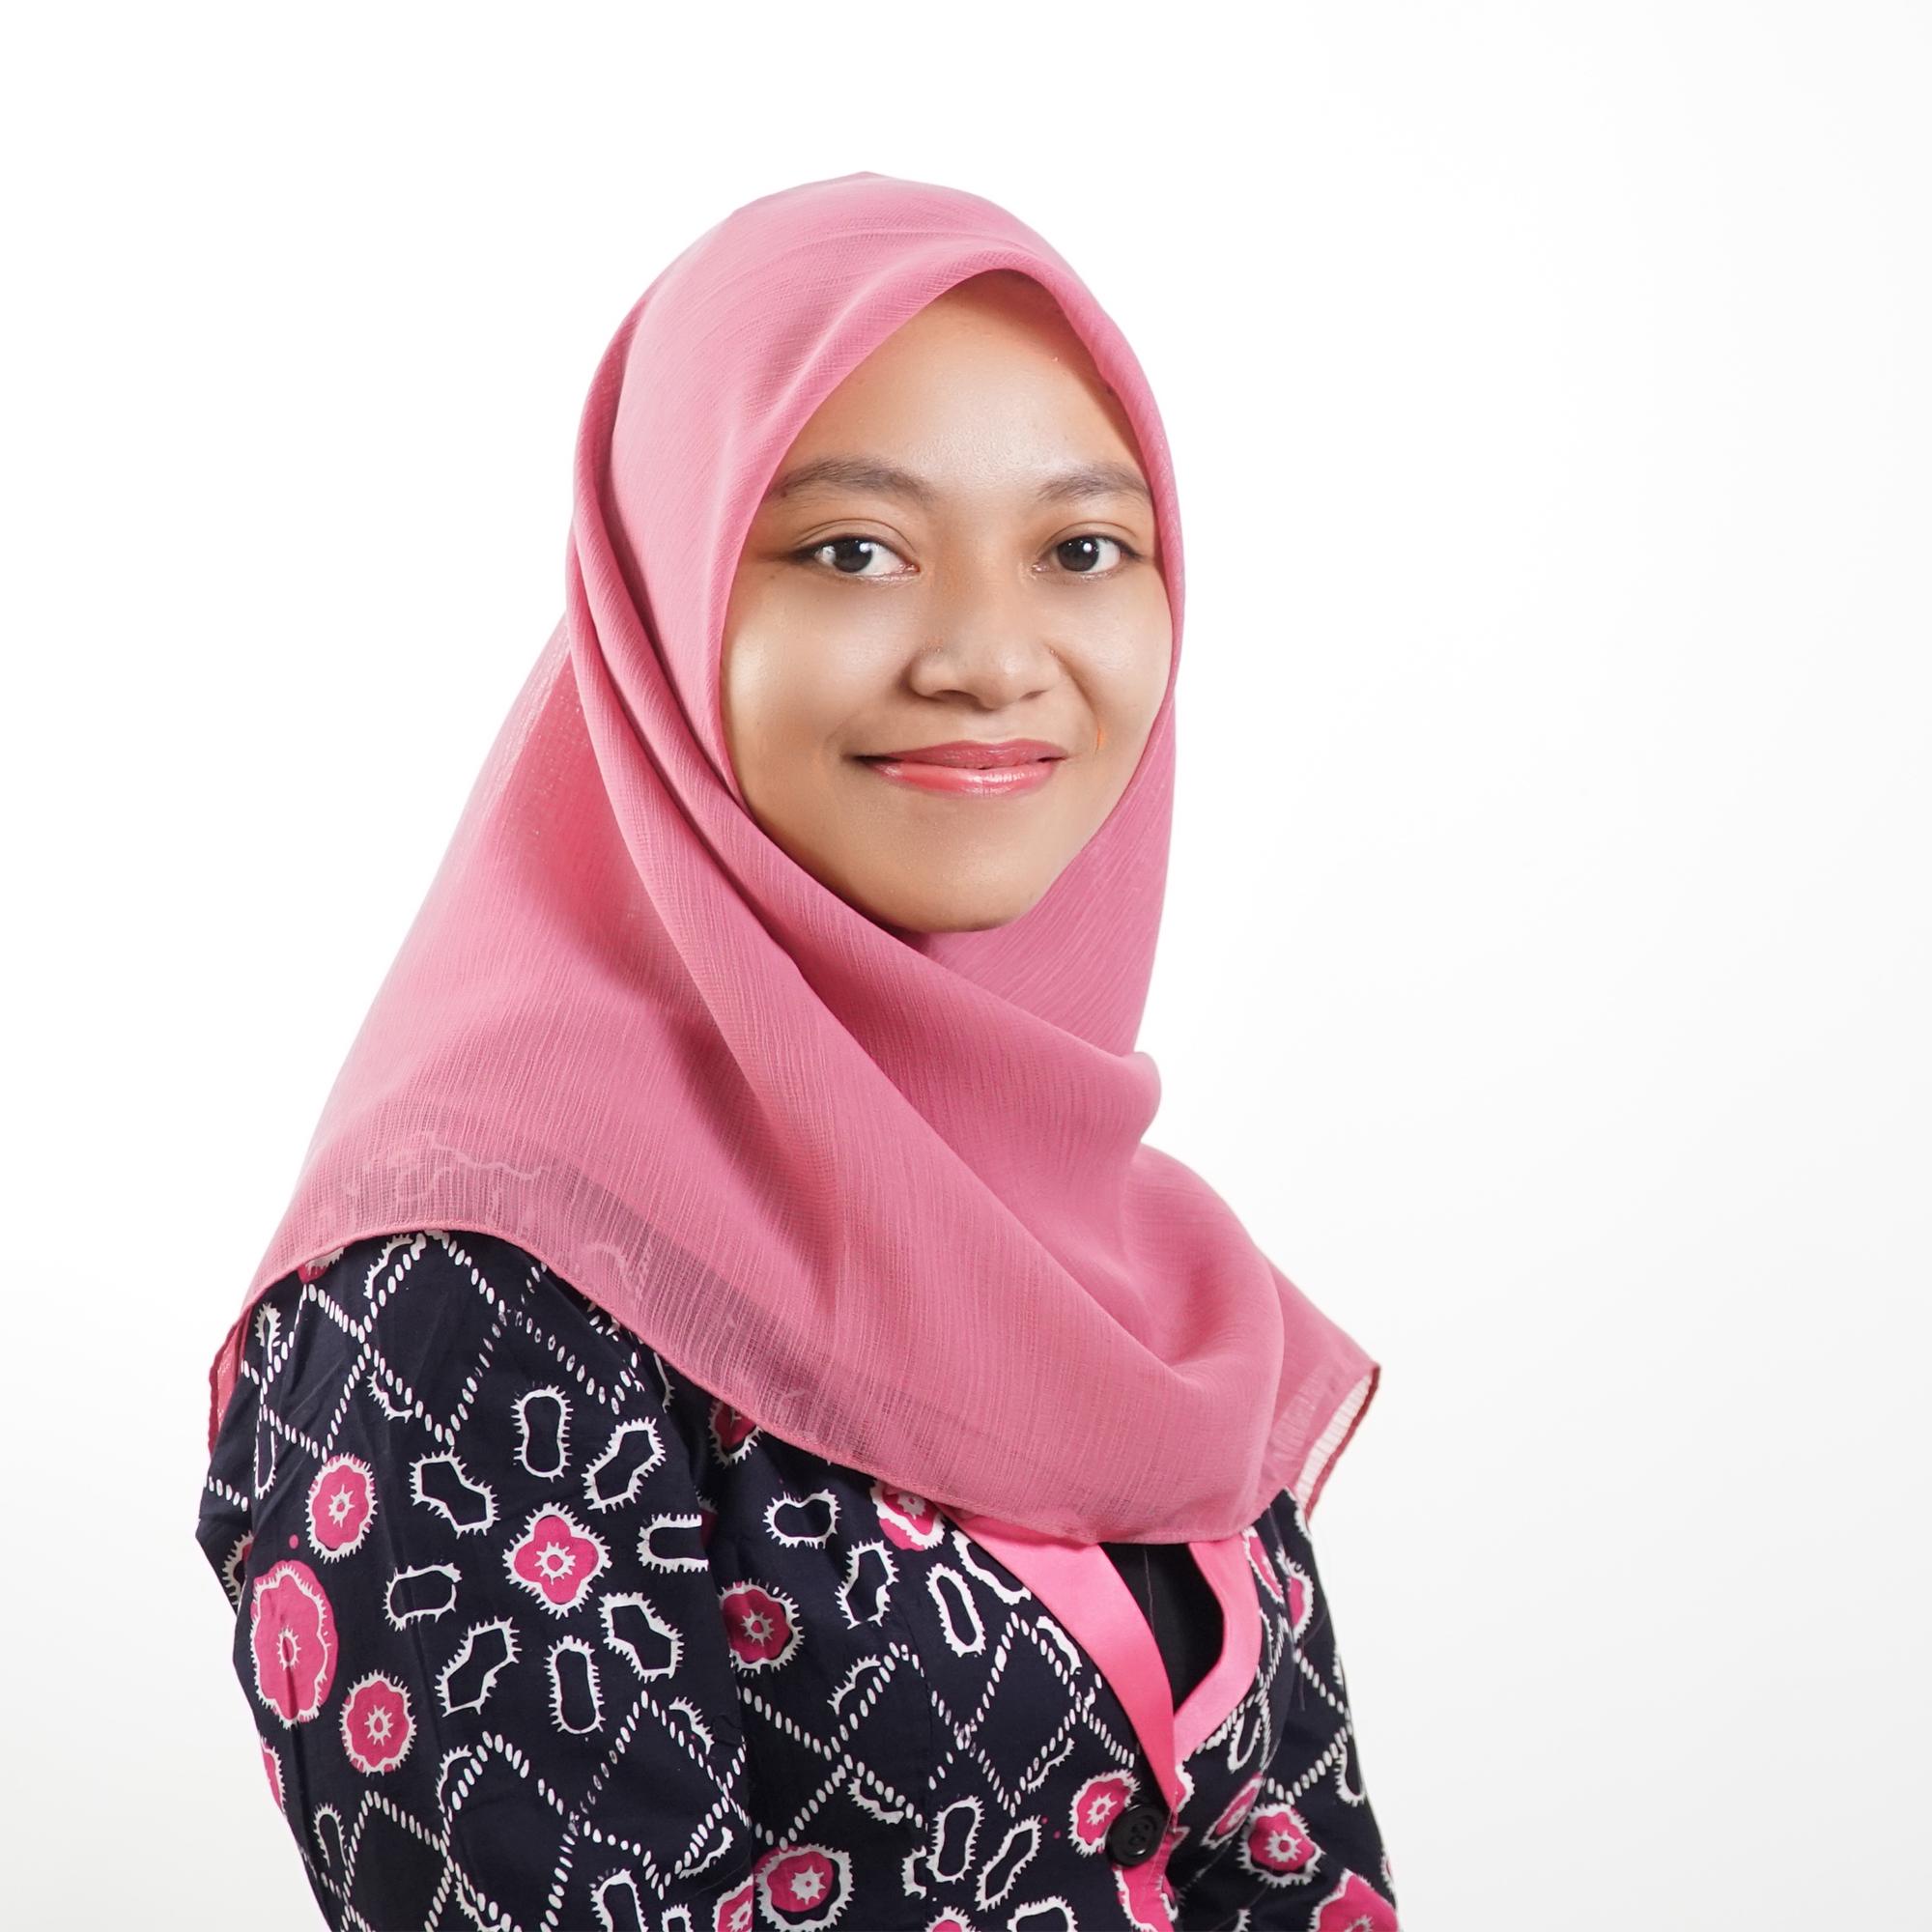 Dhea Putri Viraisyah